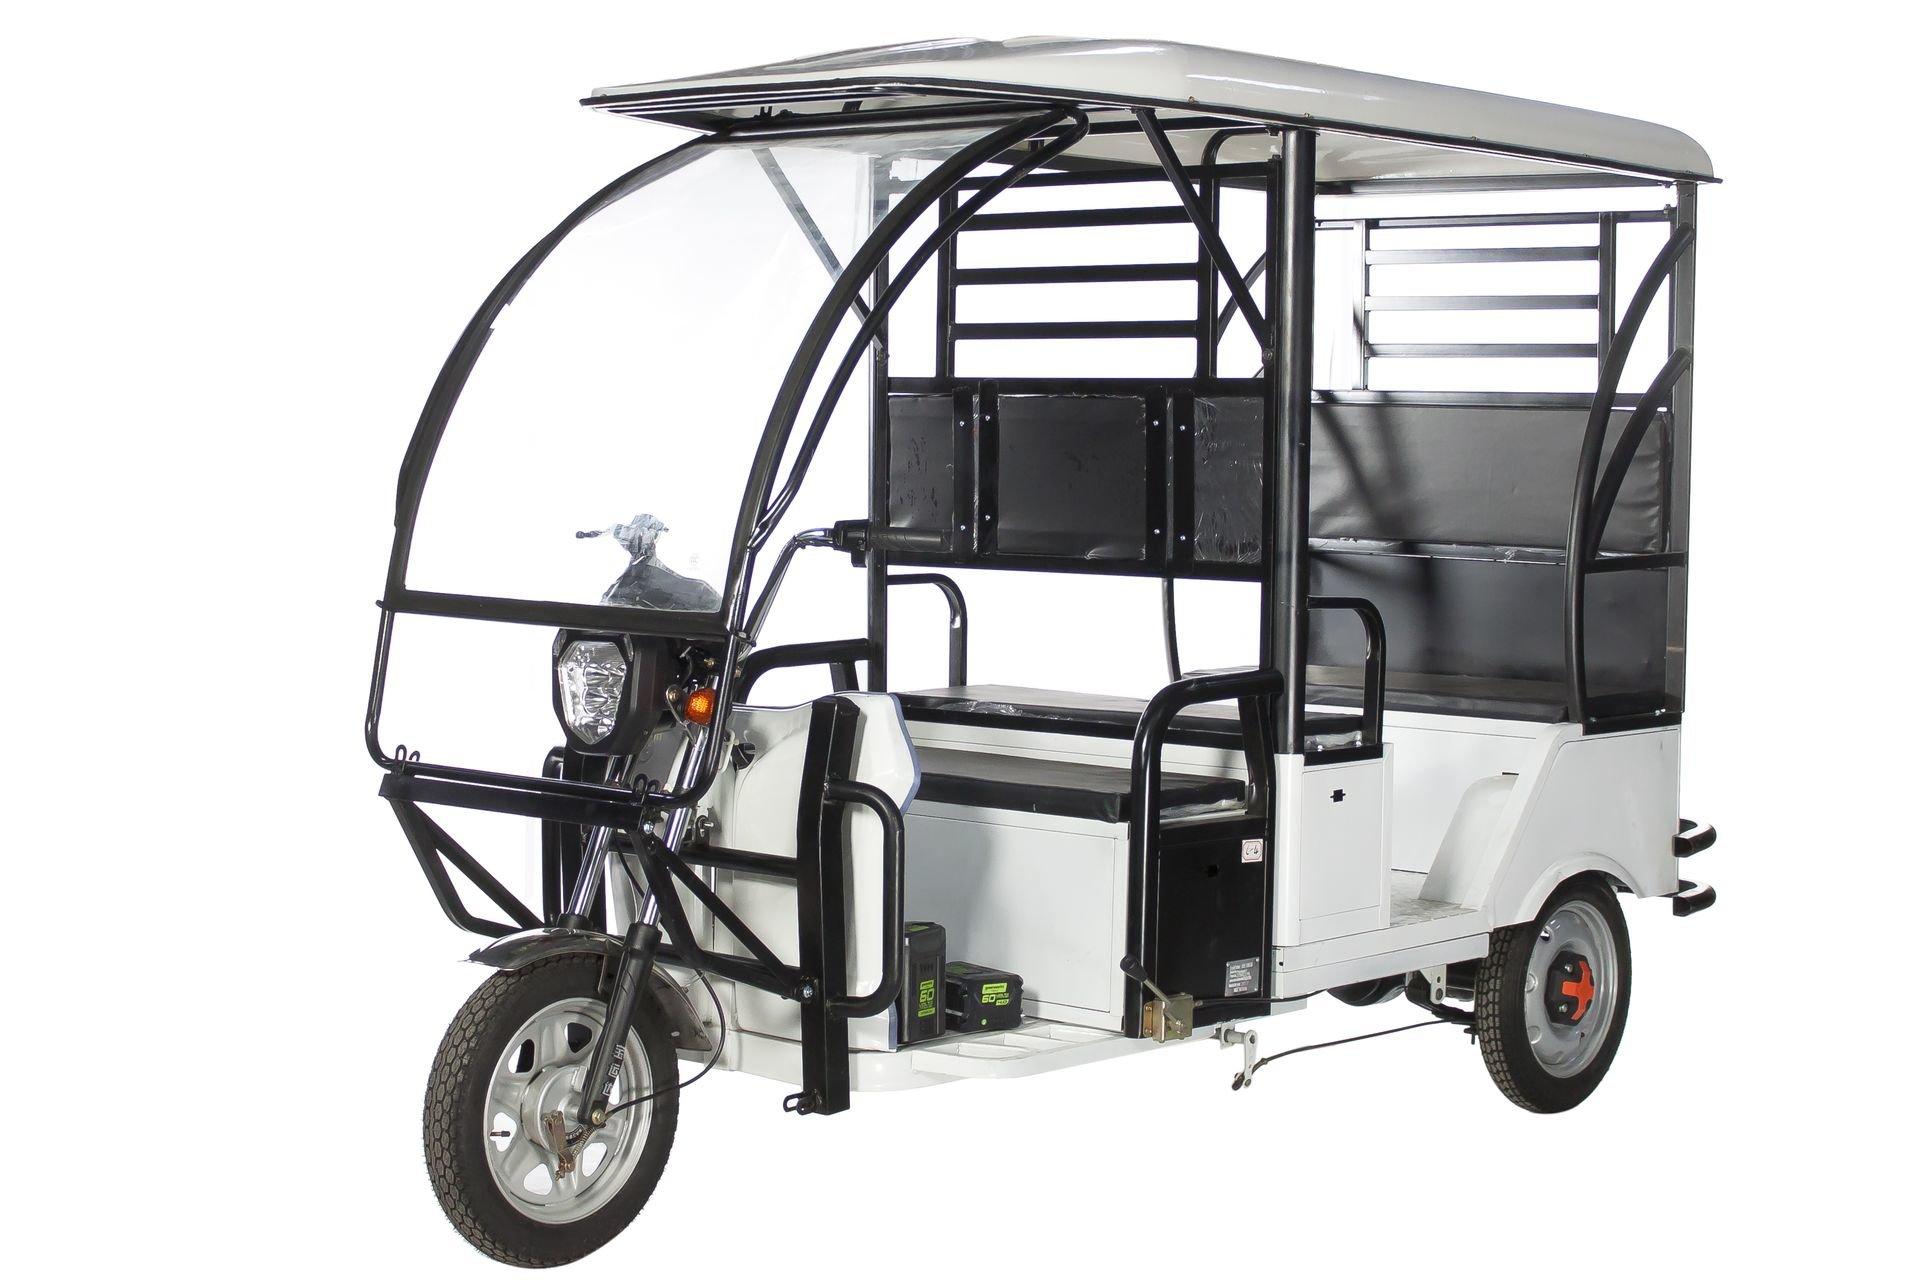 Трехколесный электроскутер OxyVolt Trike Passenger 1000w 60v